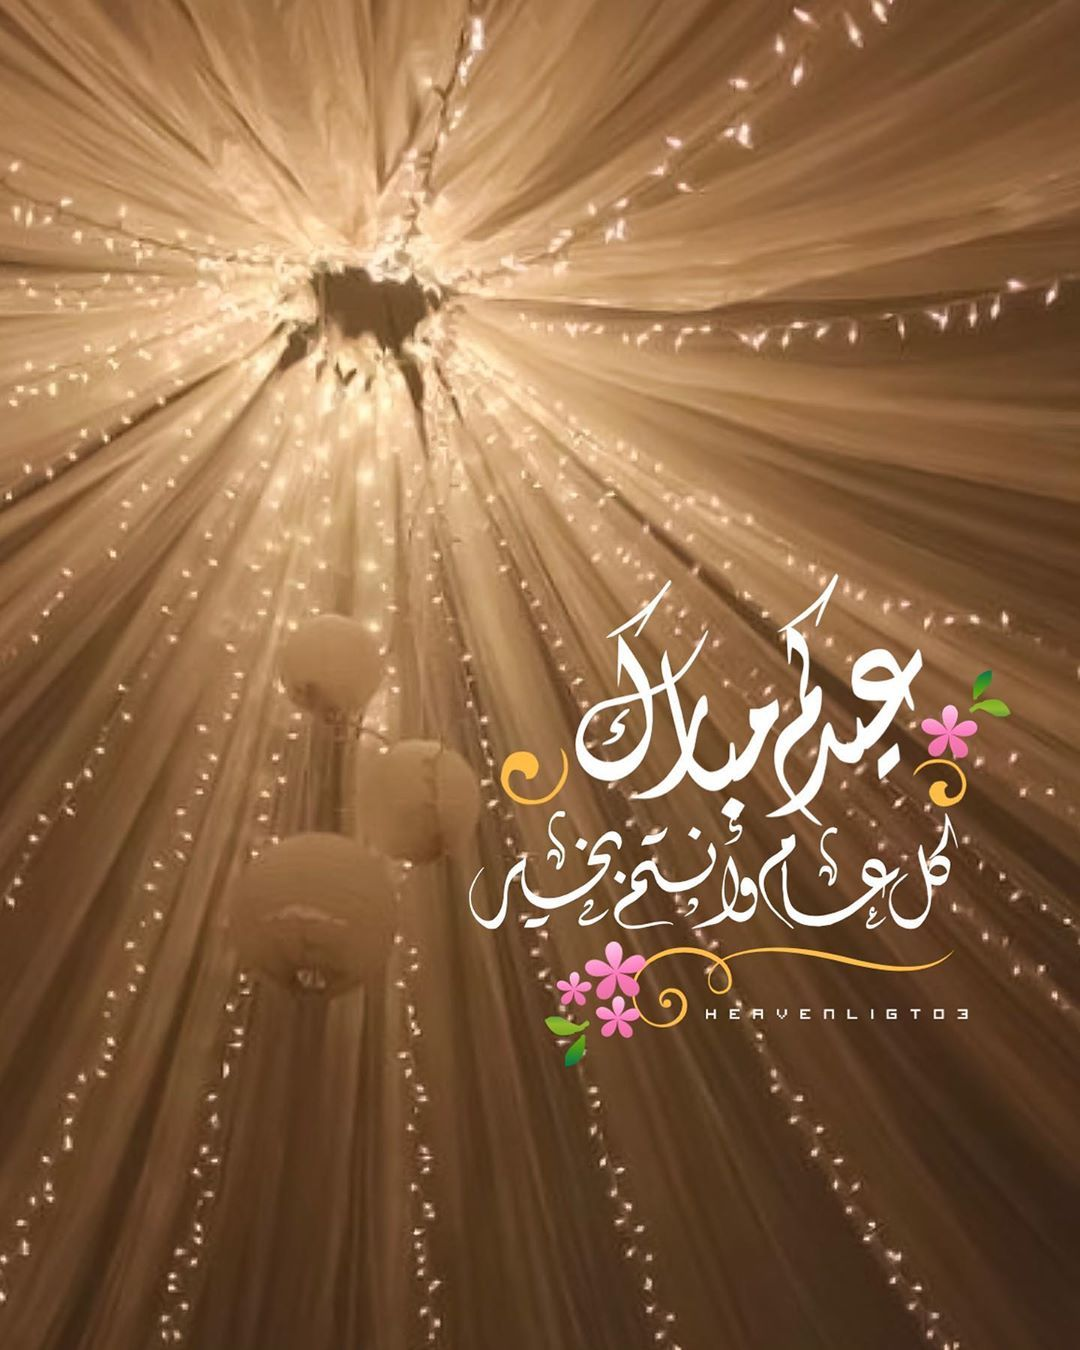 Muna On Instagram عيدكم مبارك وكل عام وأنتم بخير عيد الاضحى عيد الاضحي المبارك2 Eid Images Eid Greetings Eid Stickers